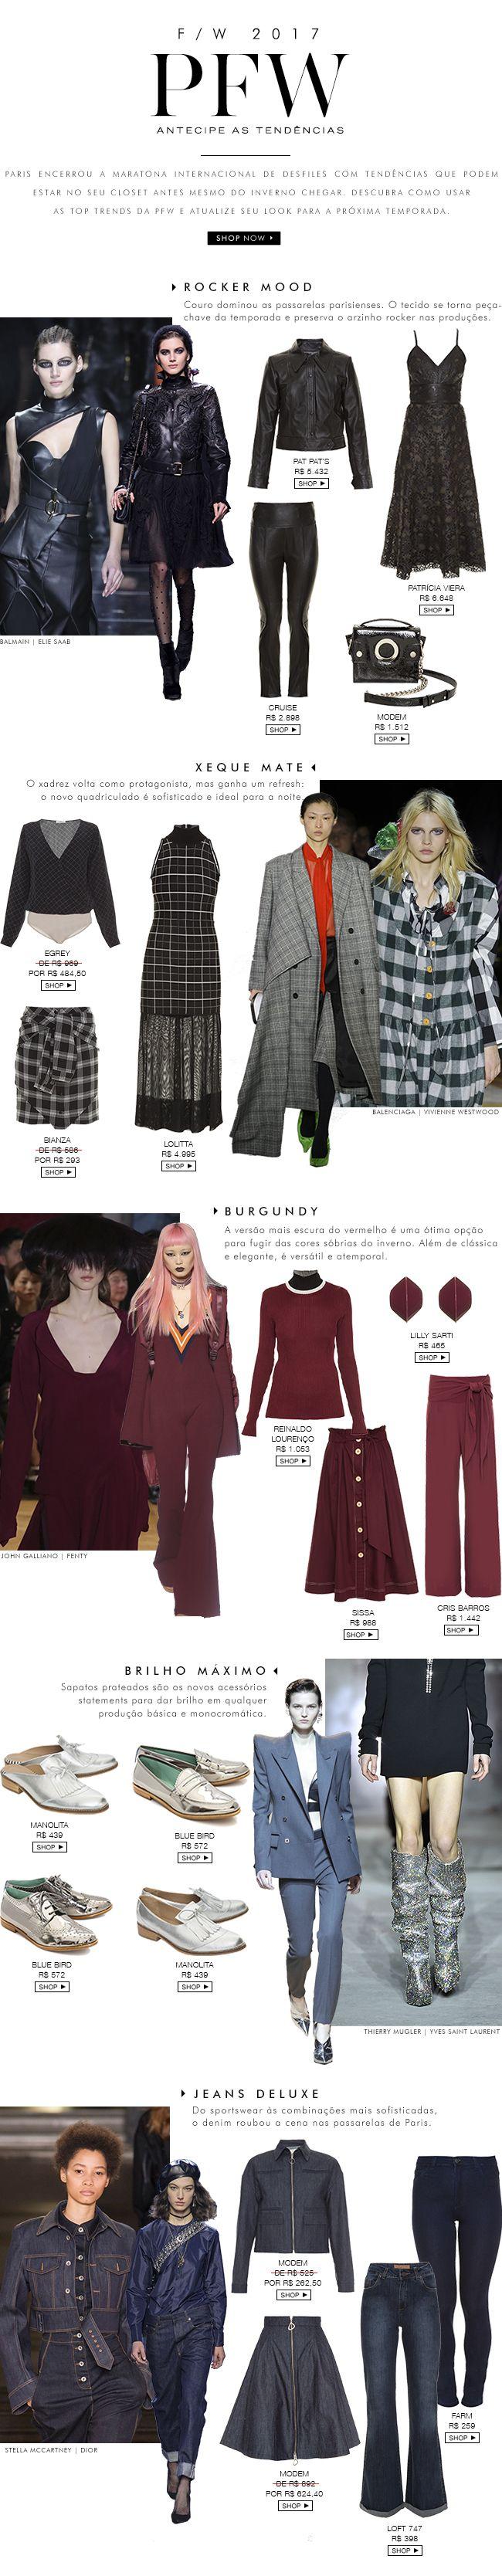 newsletter, gallerist, fashion, layout, semanas de moda internacionais, fashion week, trends, tendências, pfw,